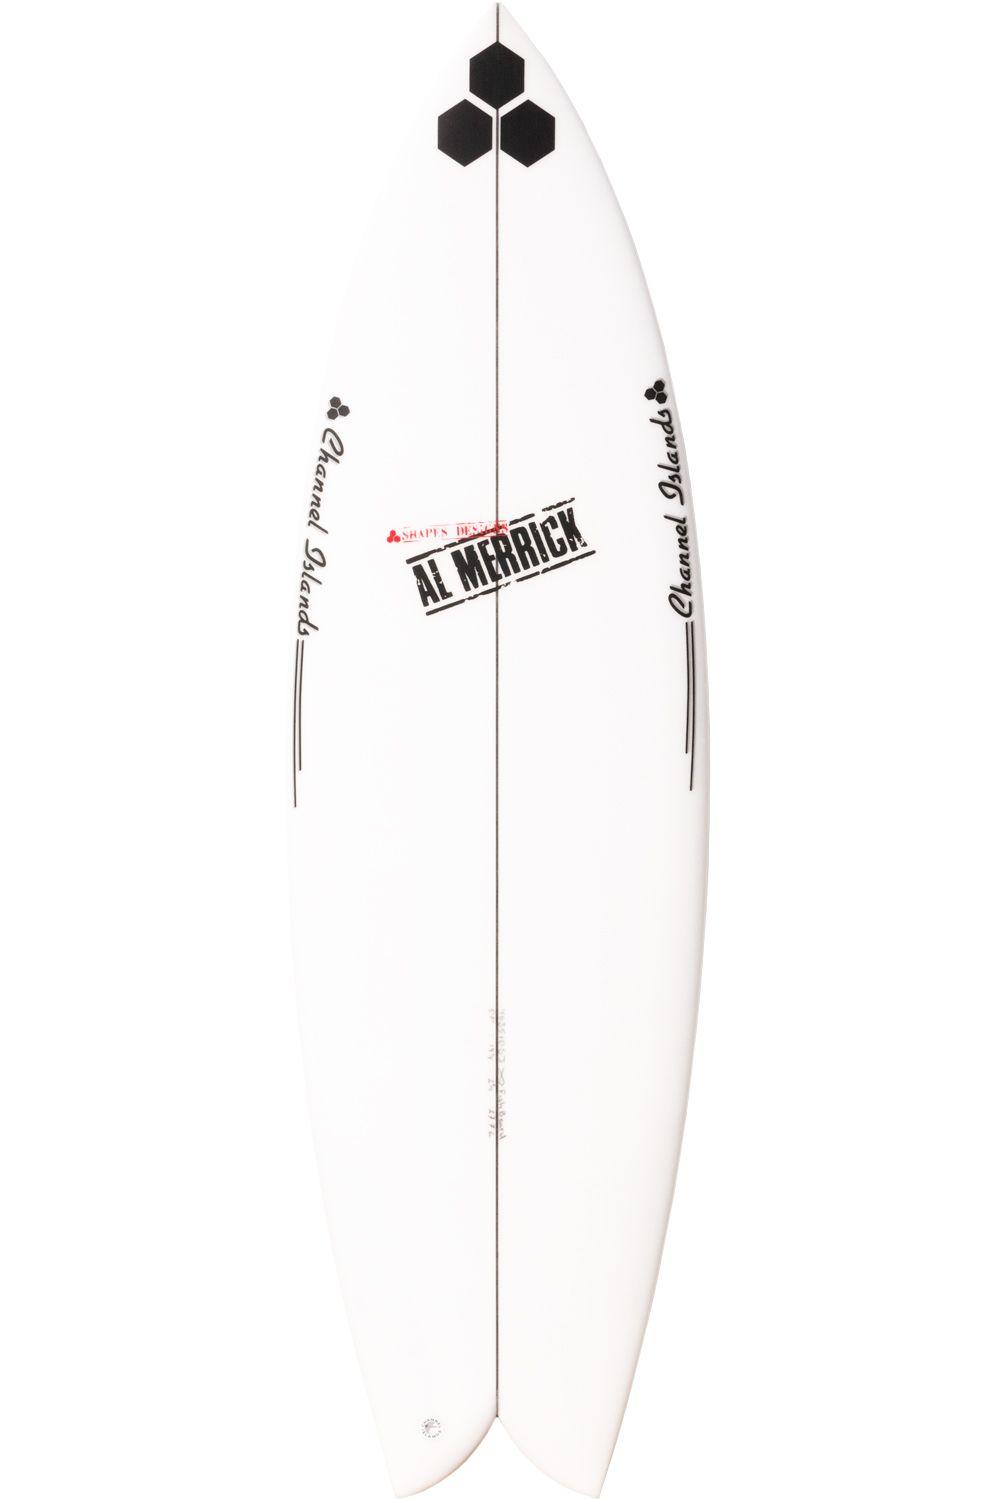 Al Merrick Surf Board 5'9 FISHBEARD Fish Tail - White Futures Twin 5ft9